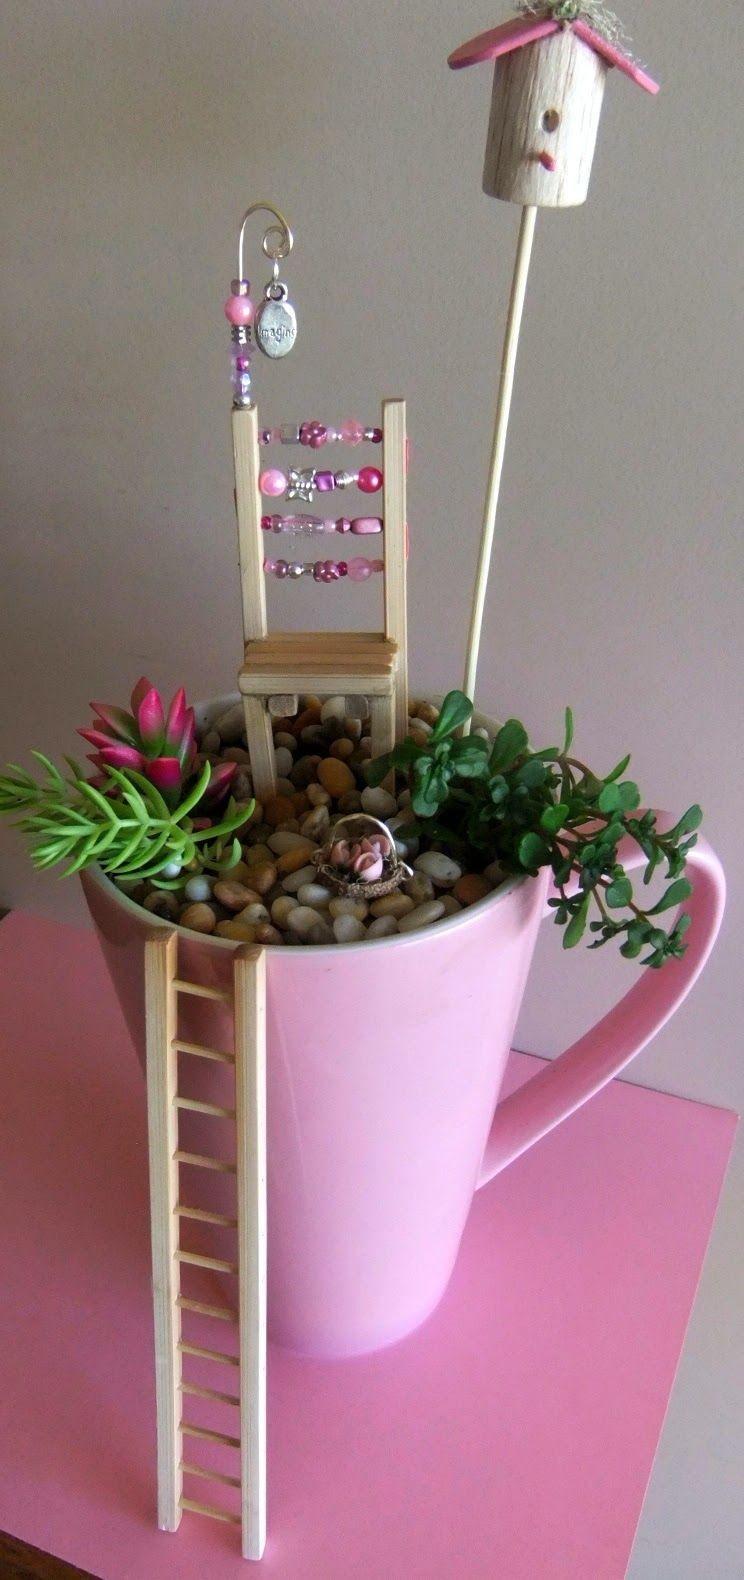 Jardin Zen Miniature Jardiland Inspirant Image Jardin Japonais Miniature Interieur Jardin Zen Japonais Miniature